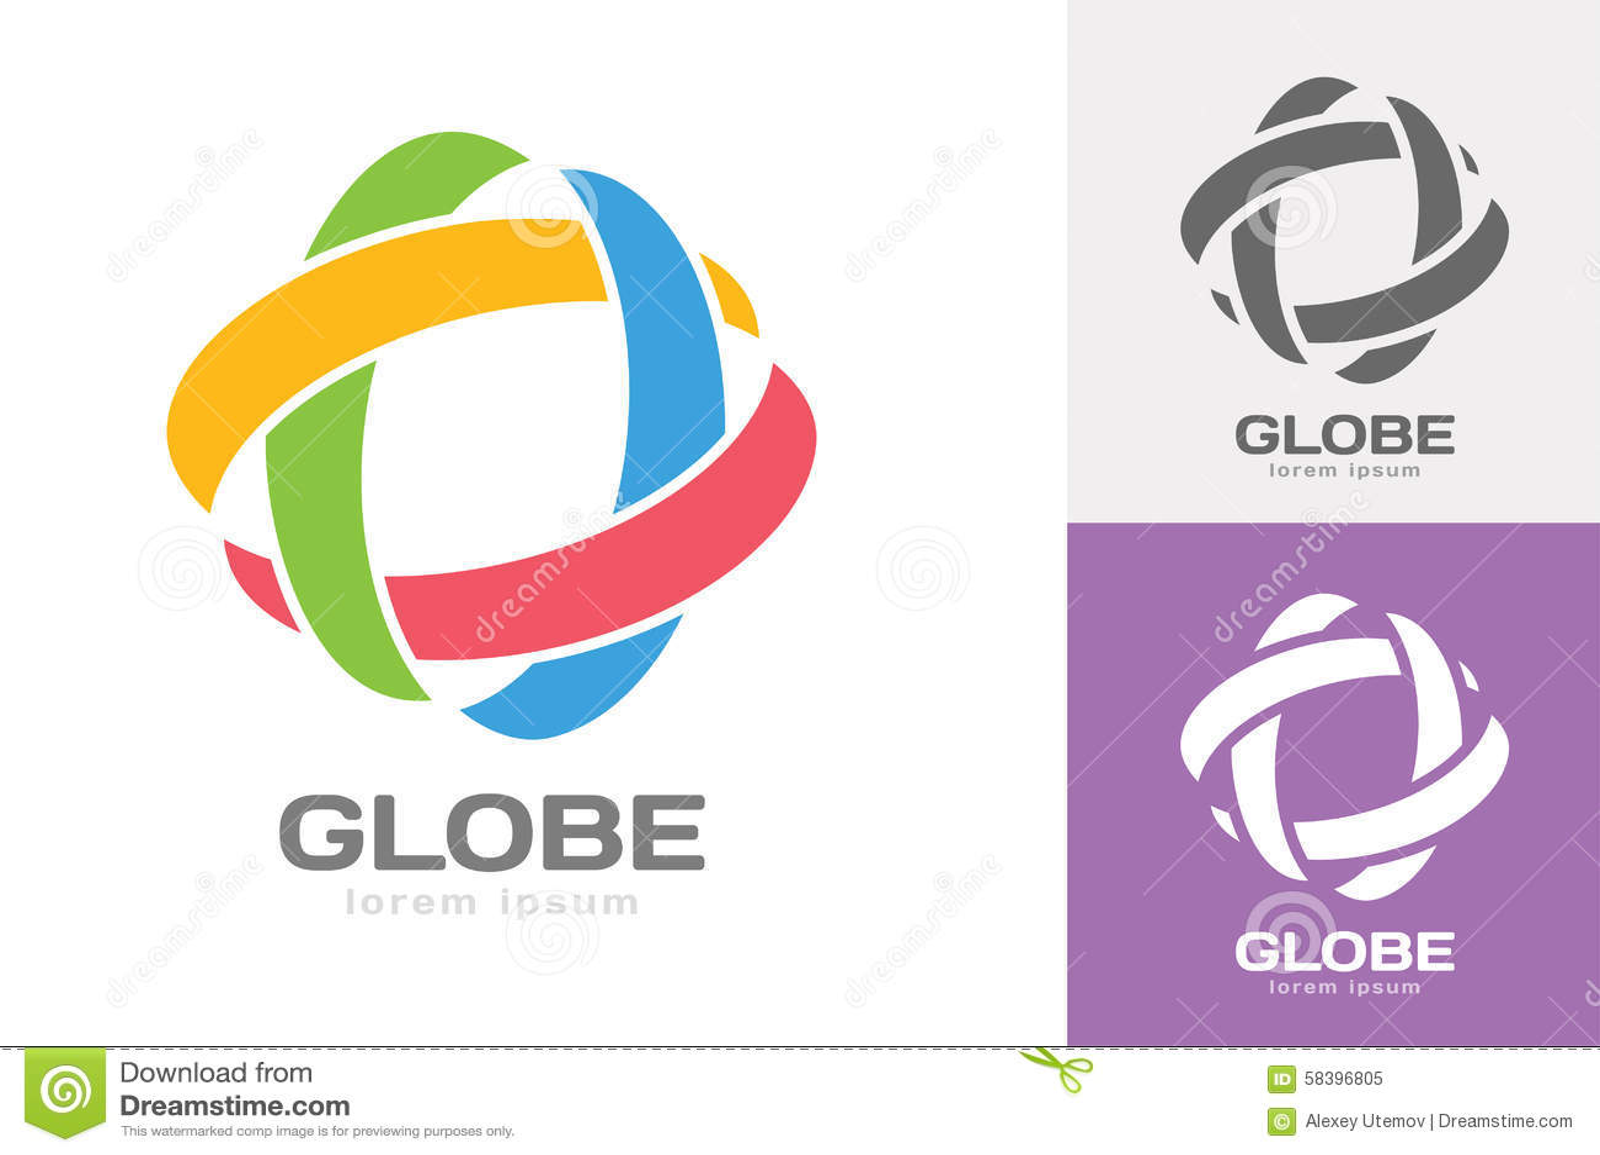 technology orbit web rings logo stock vector image 58396805. Black Bedroom Furniture Sets. Home Design Ideas